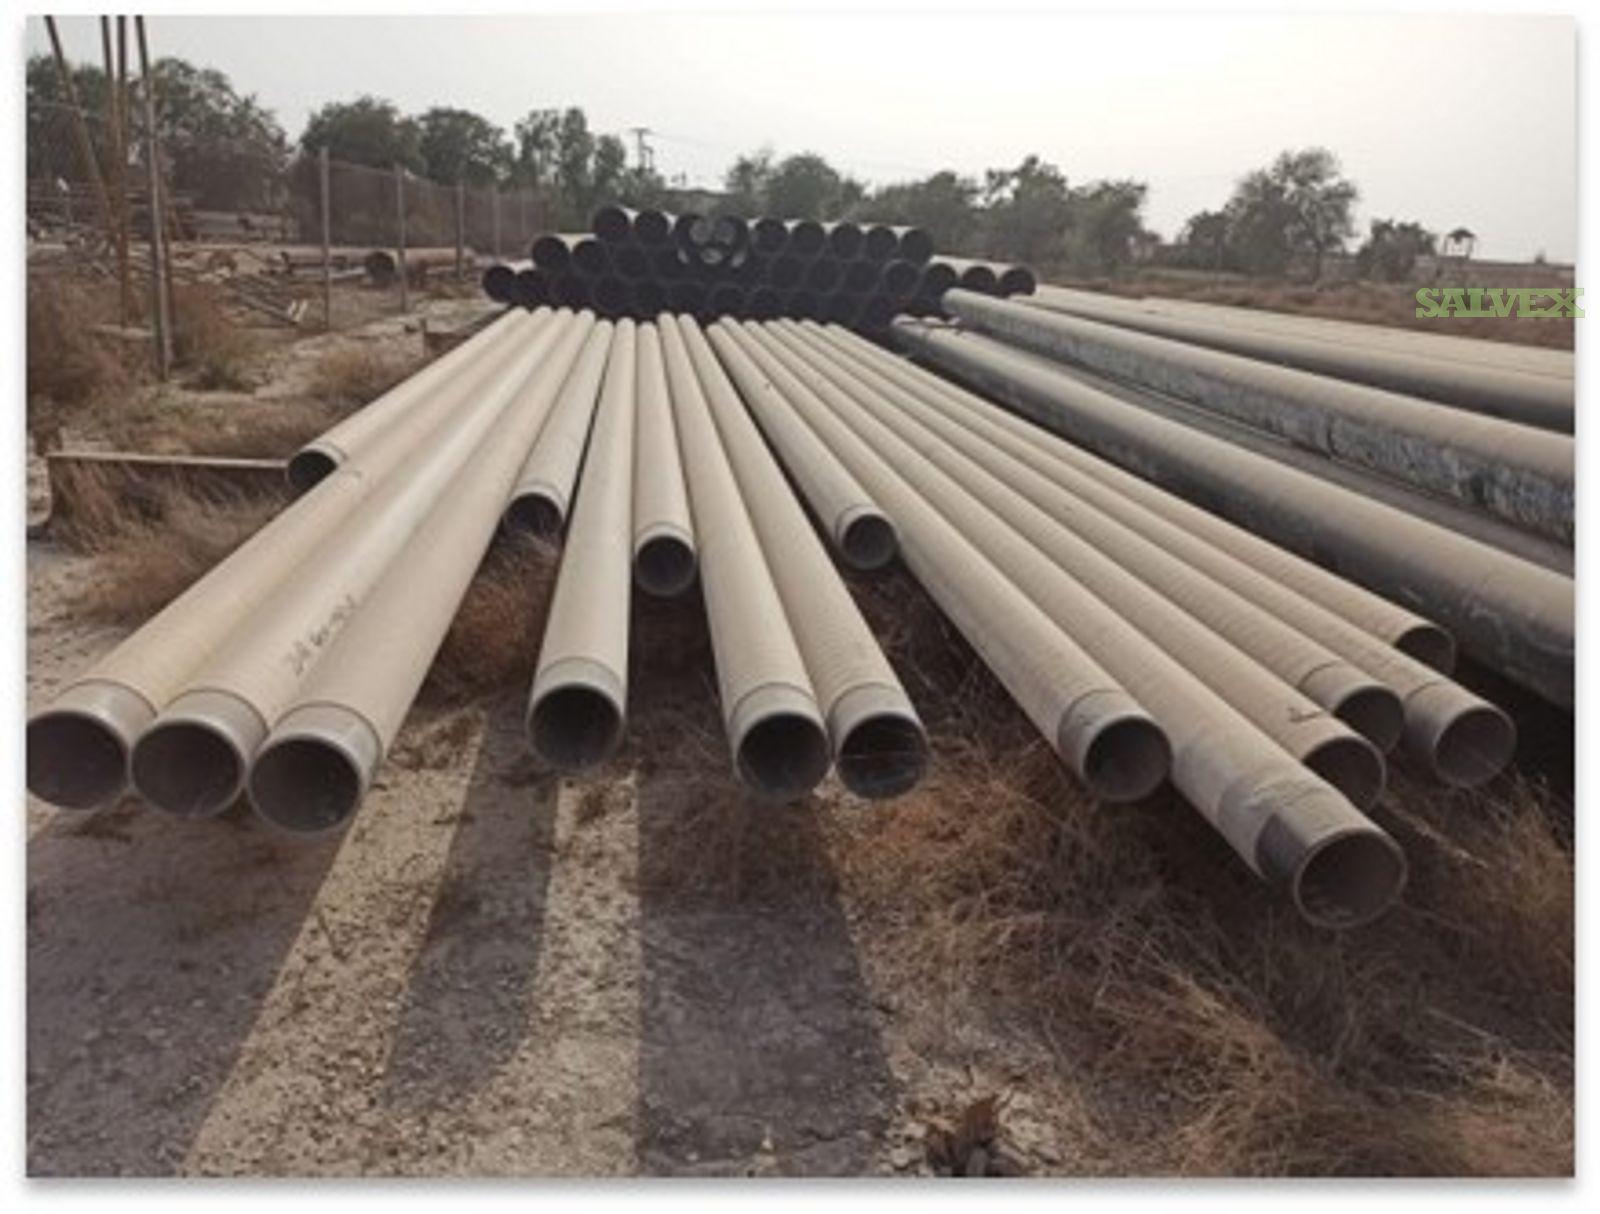 8 27.09# 22CR Used Flow Line (65,617 Feet / 806 Metric Tons)